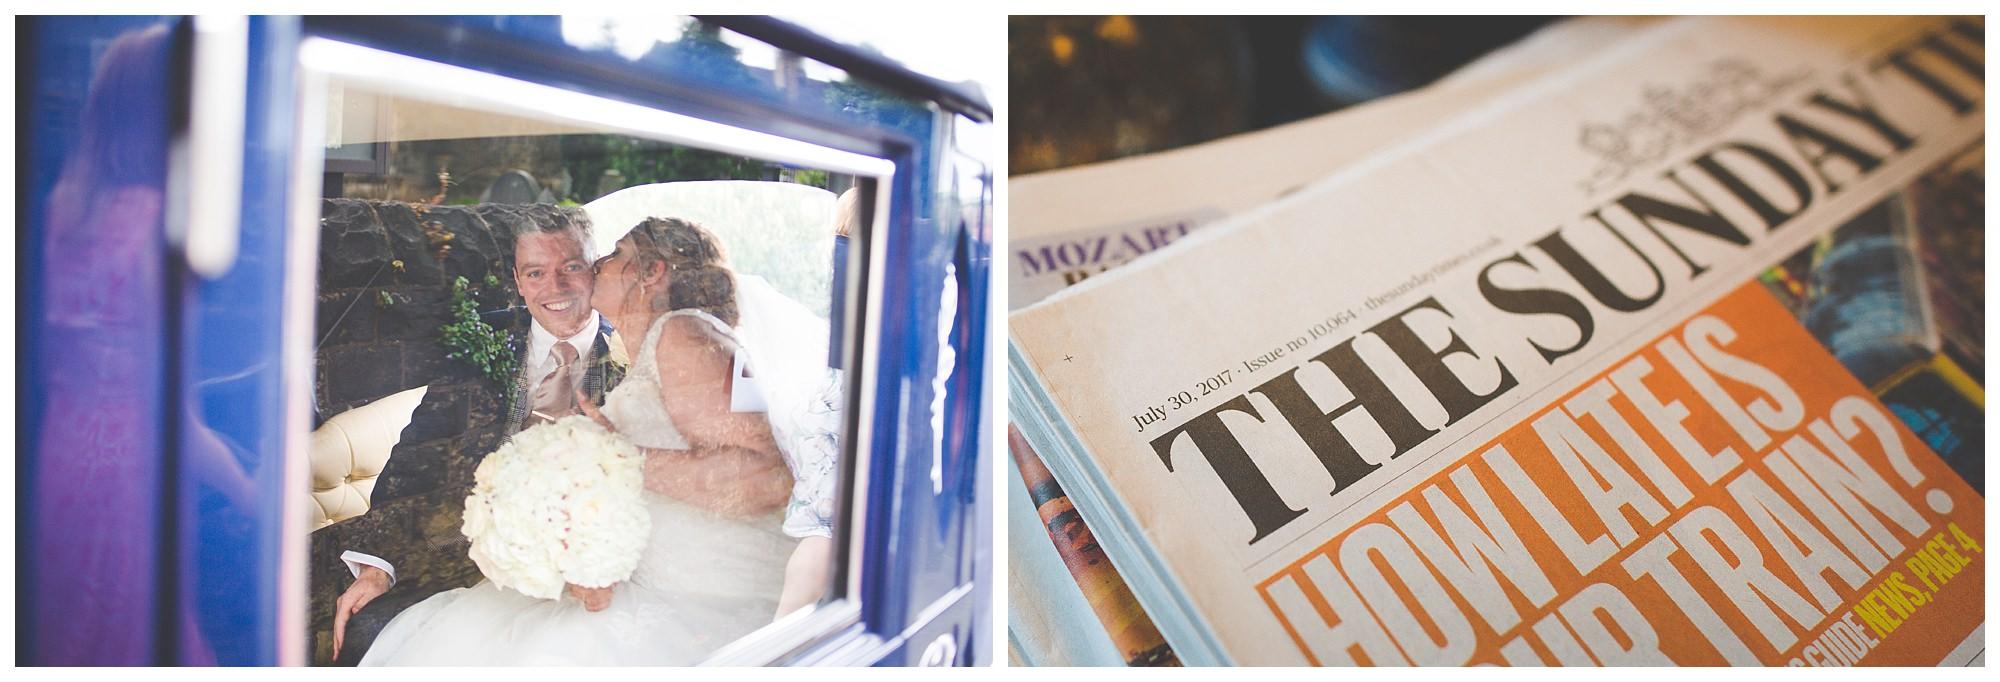 Bagden-Hall-Wedding-Photography_0031